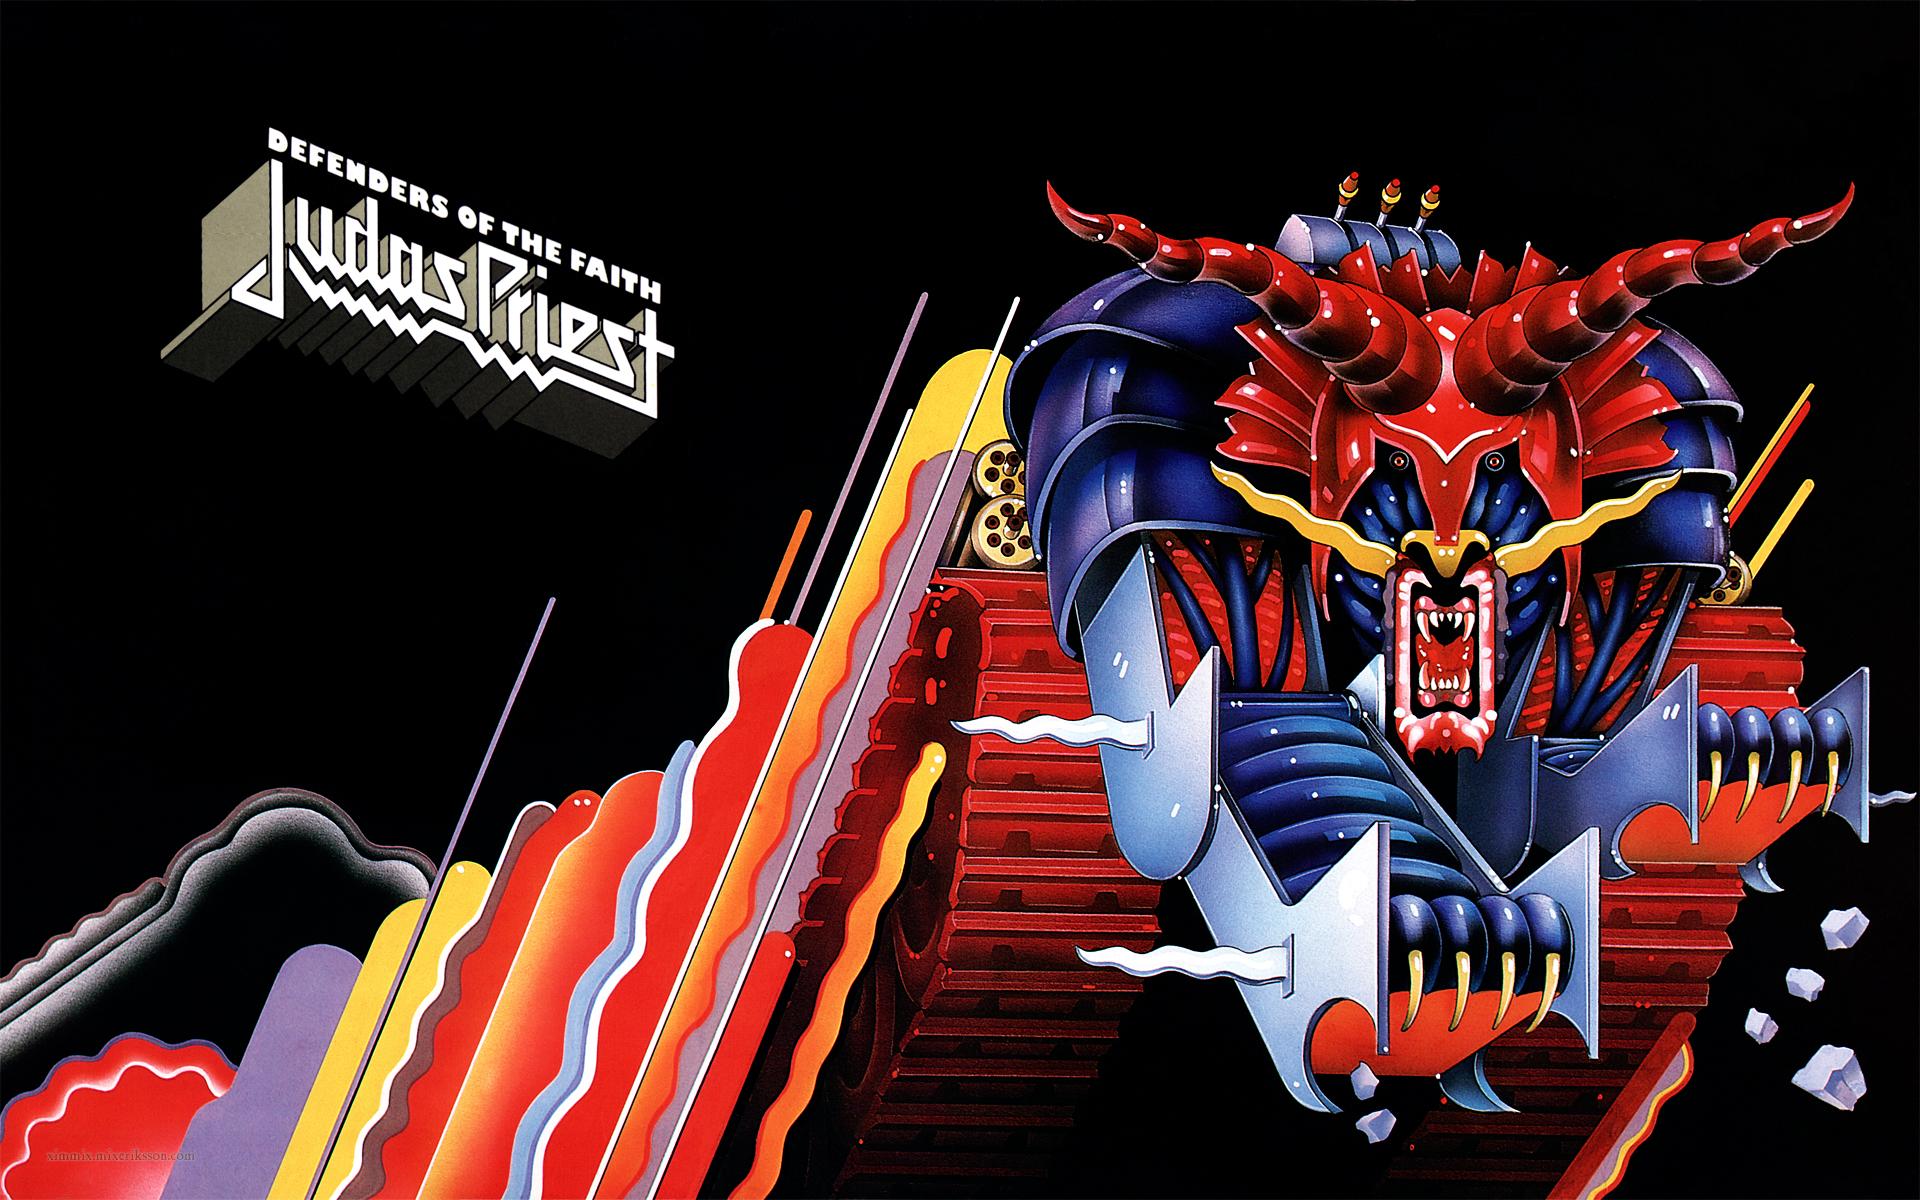 Judas Priest Hd Wallpaper Background Image 1920x1200 Id